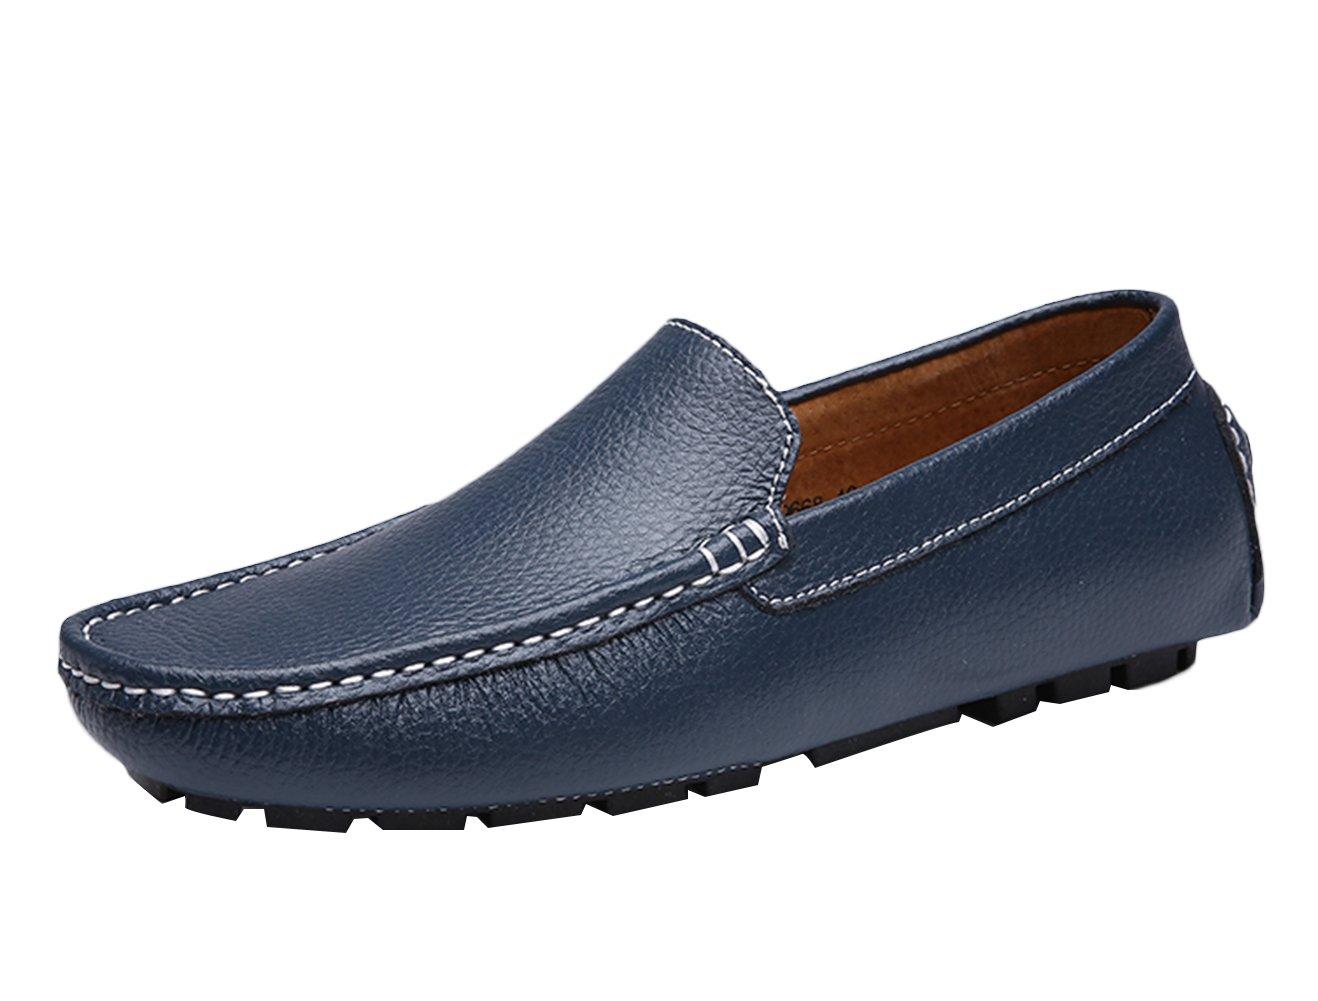 SK Studio Hombre Mocasines Zapatos Del Barco Respirable Calzado de Cuero Zapatos de Conducción Mocasine 42 EU|Azul Oscuro